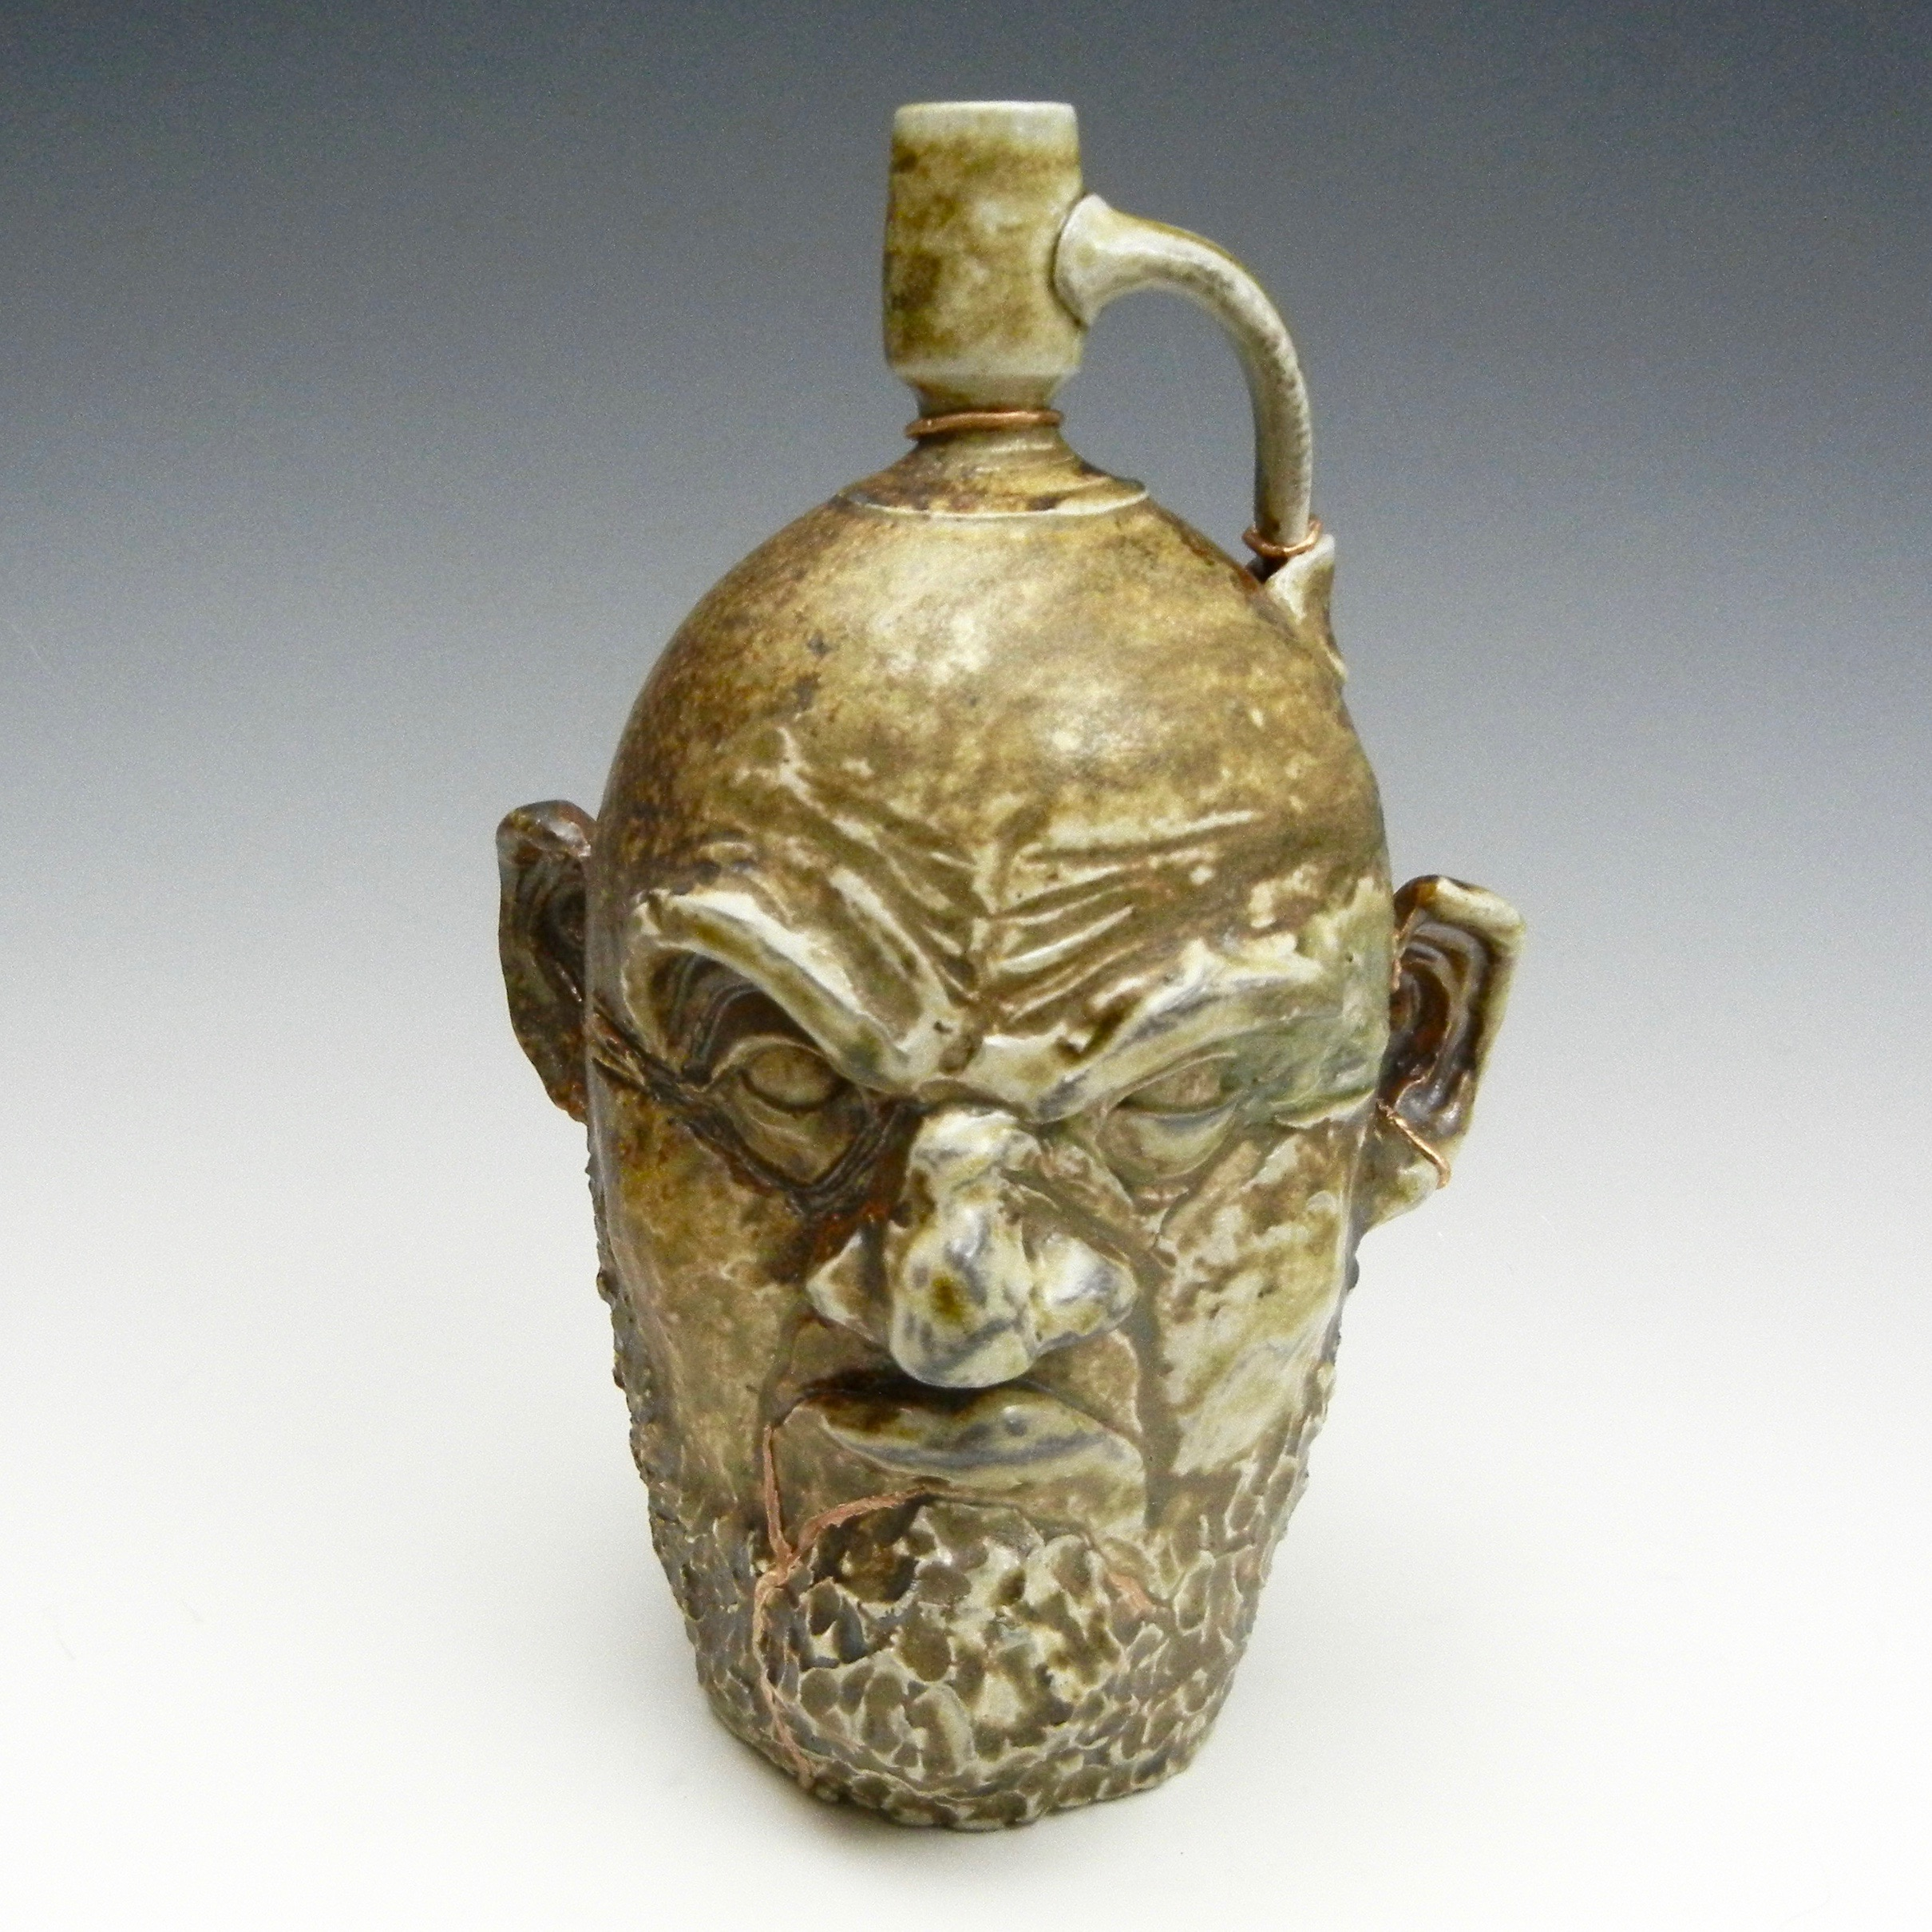 Lorenz Pottery, handmade, ceramics, pottery, folk pottery, wood fired, soda fired, jug, face jug, ugly jug